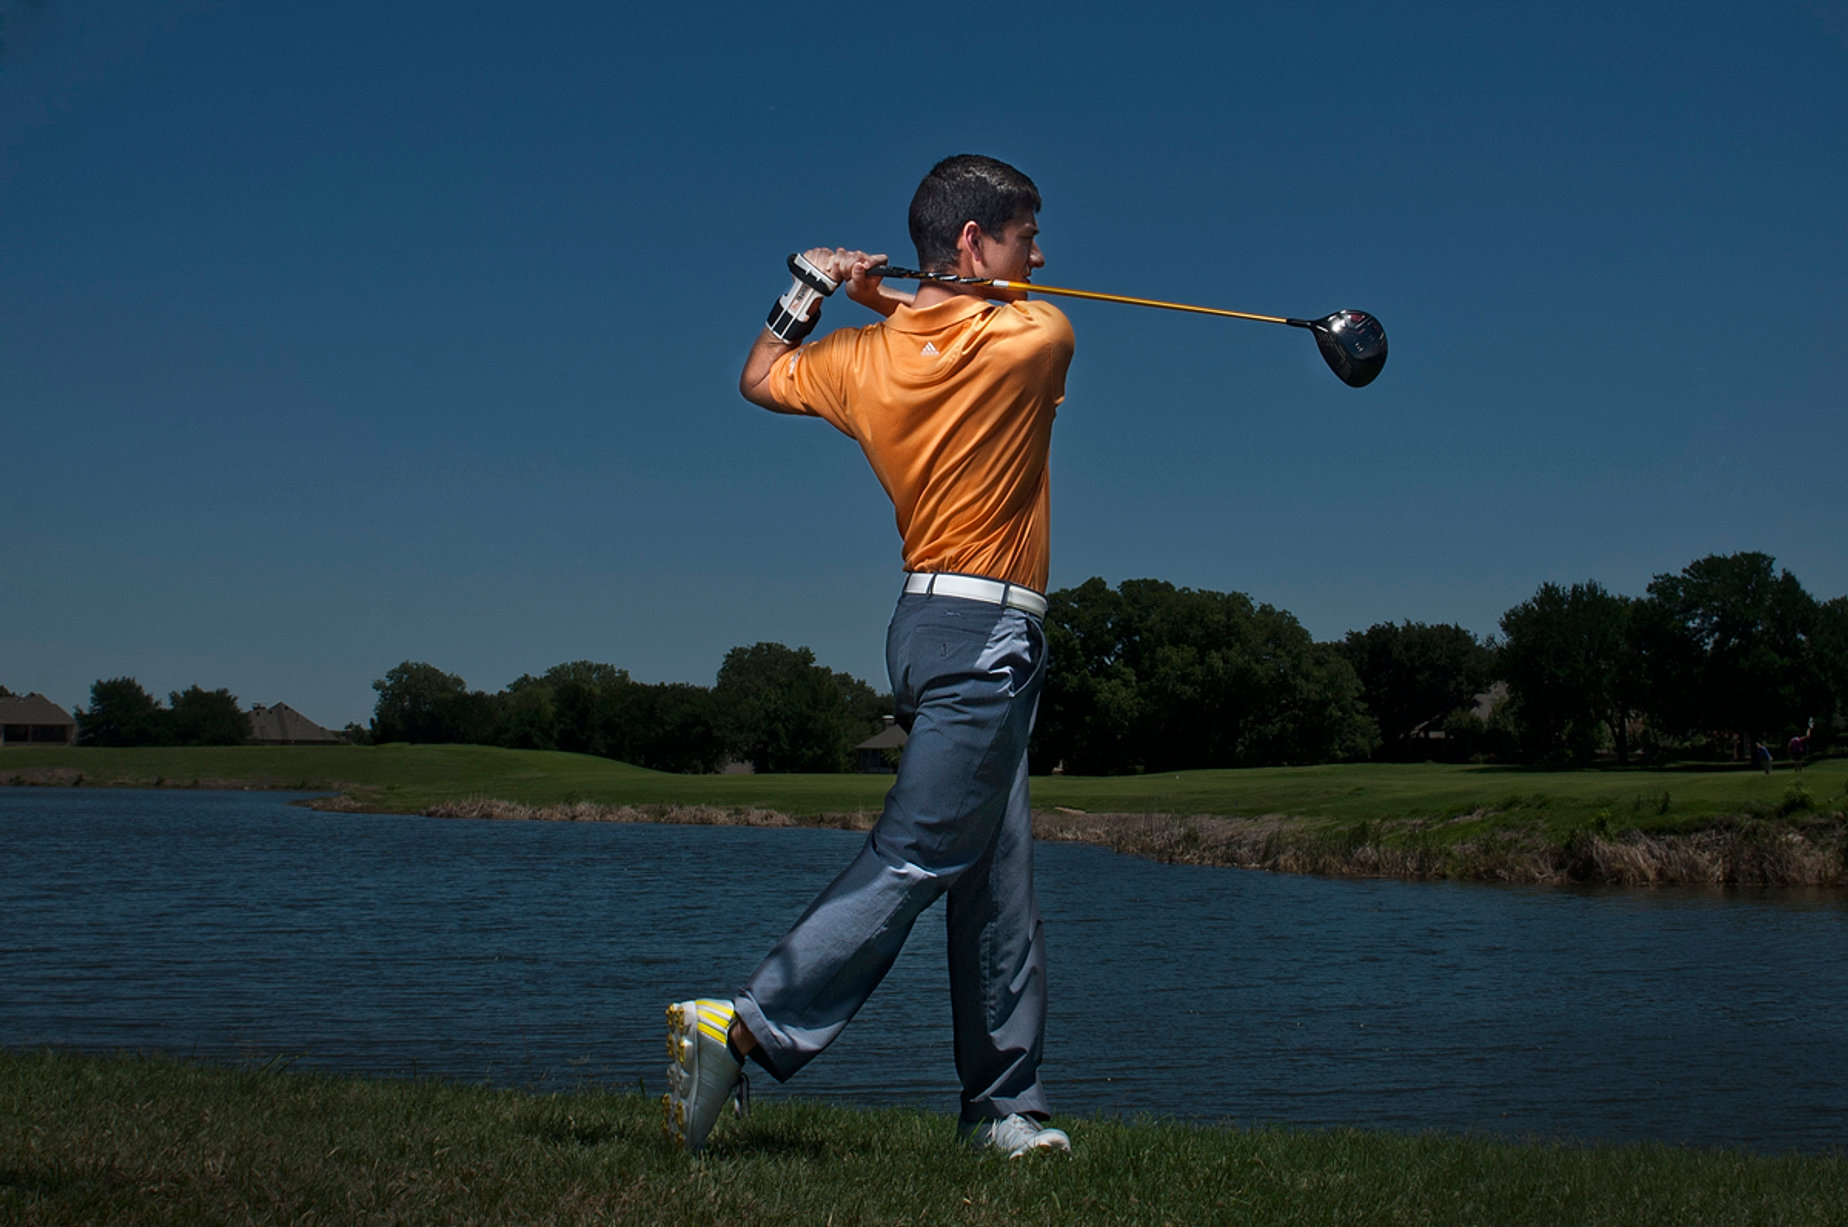 Golf Training Aid Swing Top